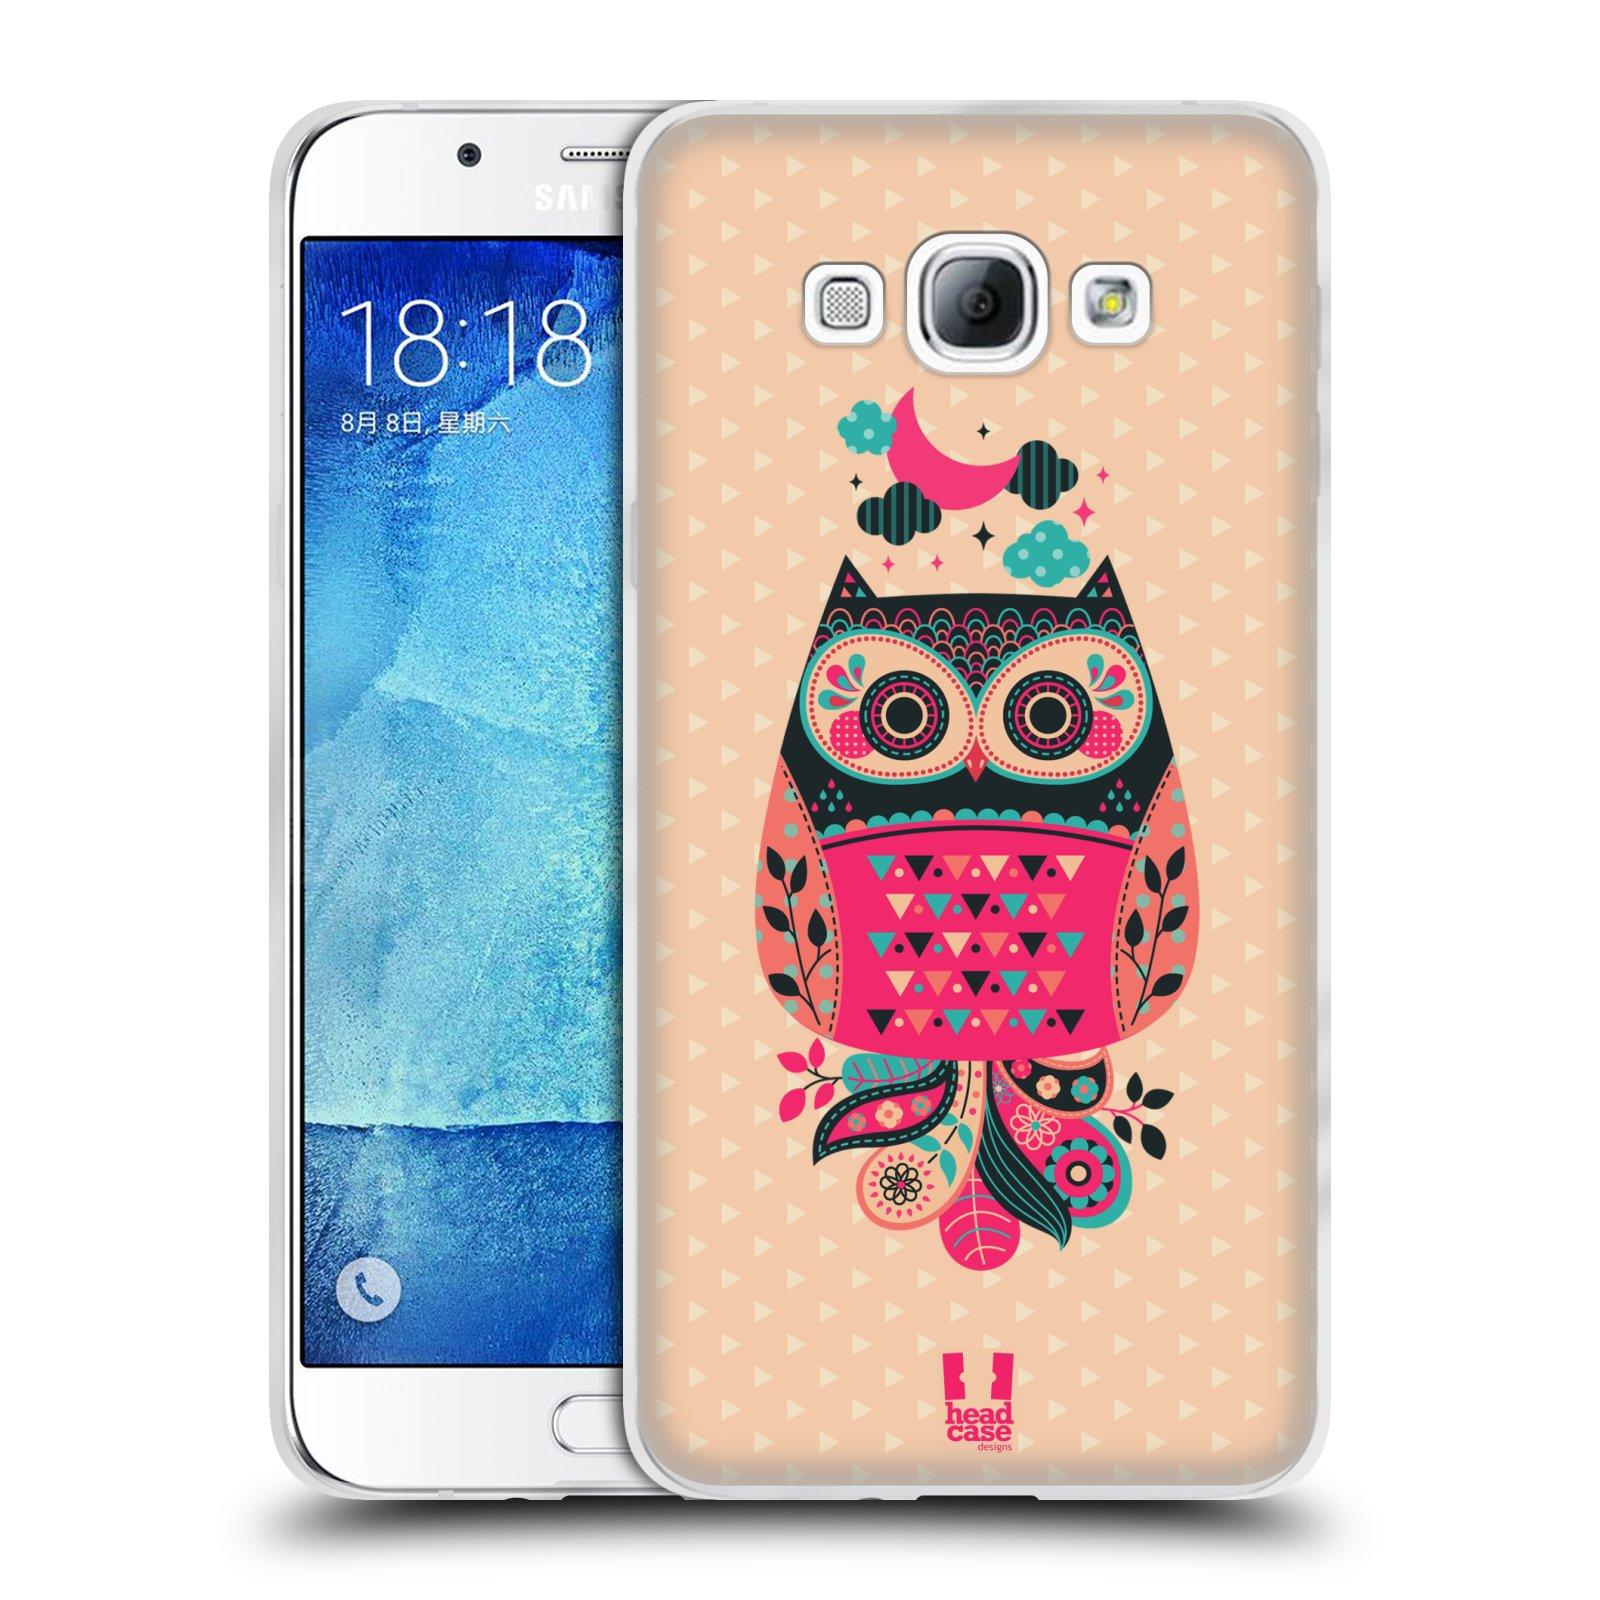 HEAD CASE silikonový obal na mobil Samsung Galaxy A8 vzor Stmívání sovička černá a korálová